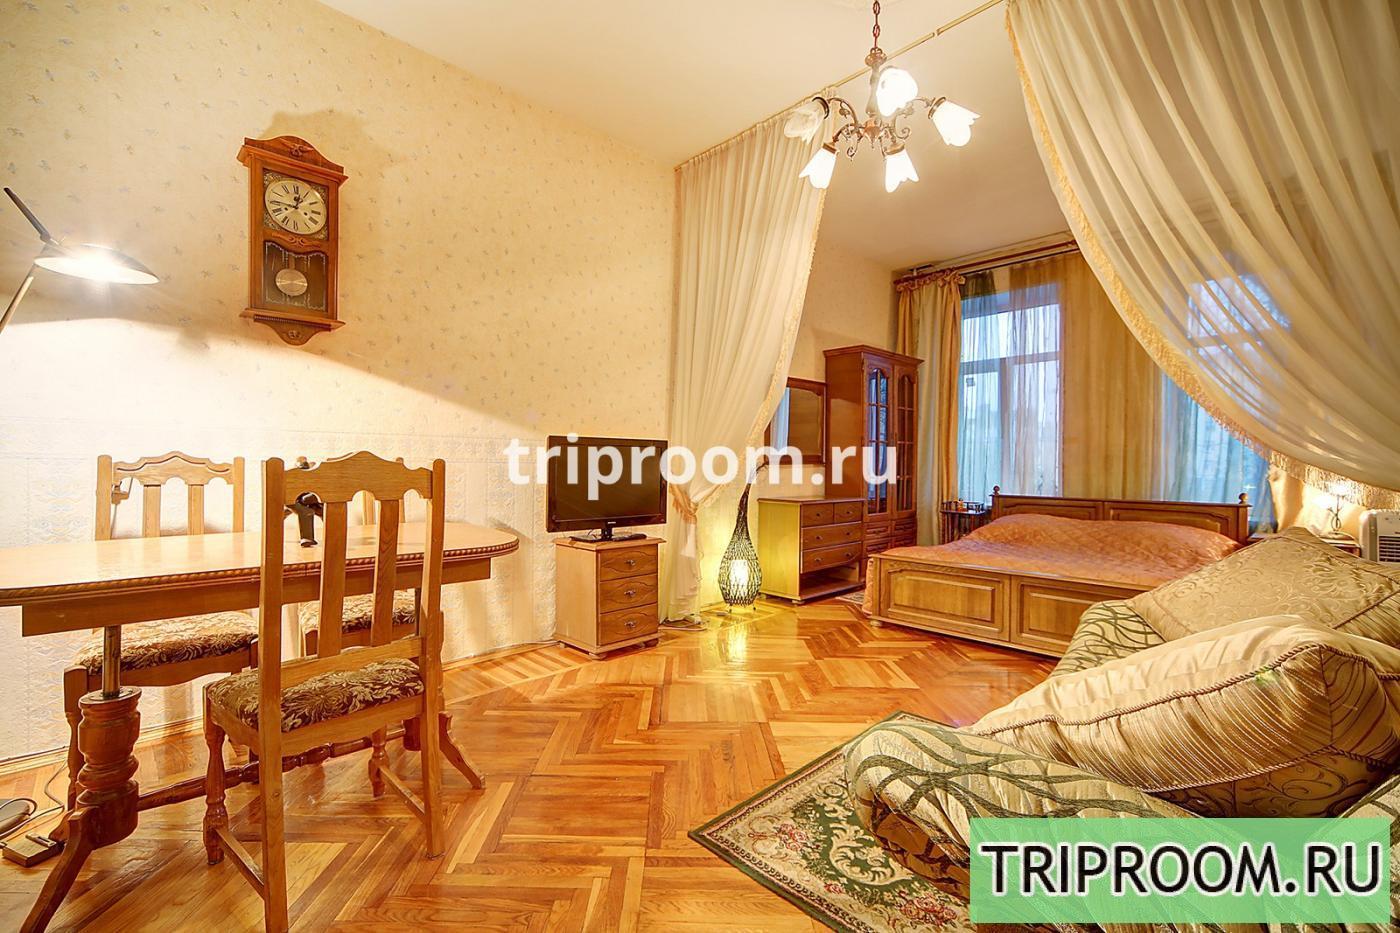 1-комнатная квартира посуточно (вариант № 15445), ул. Лиговский проспект, фото № 1